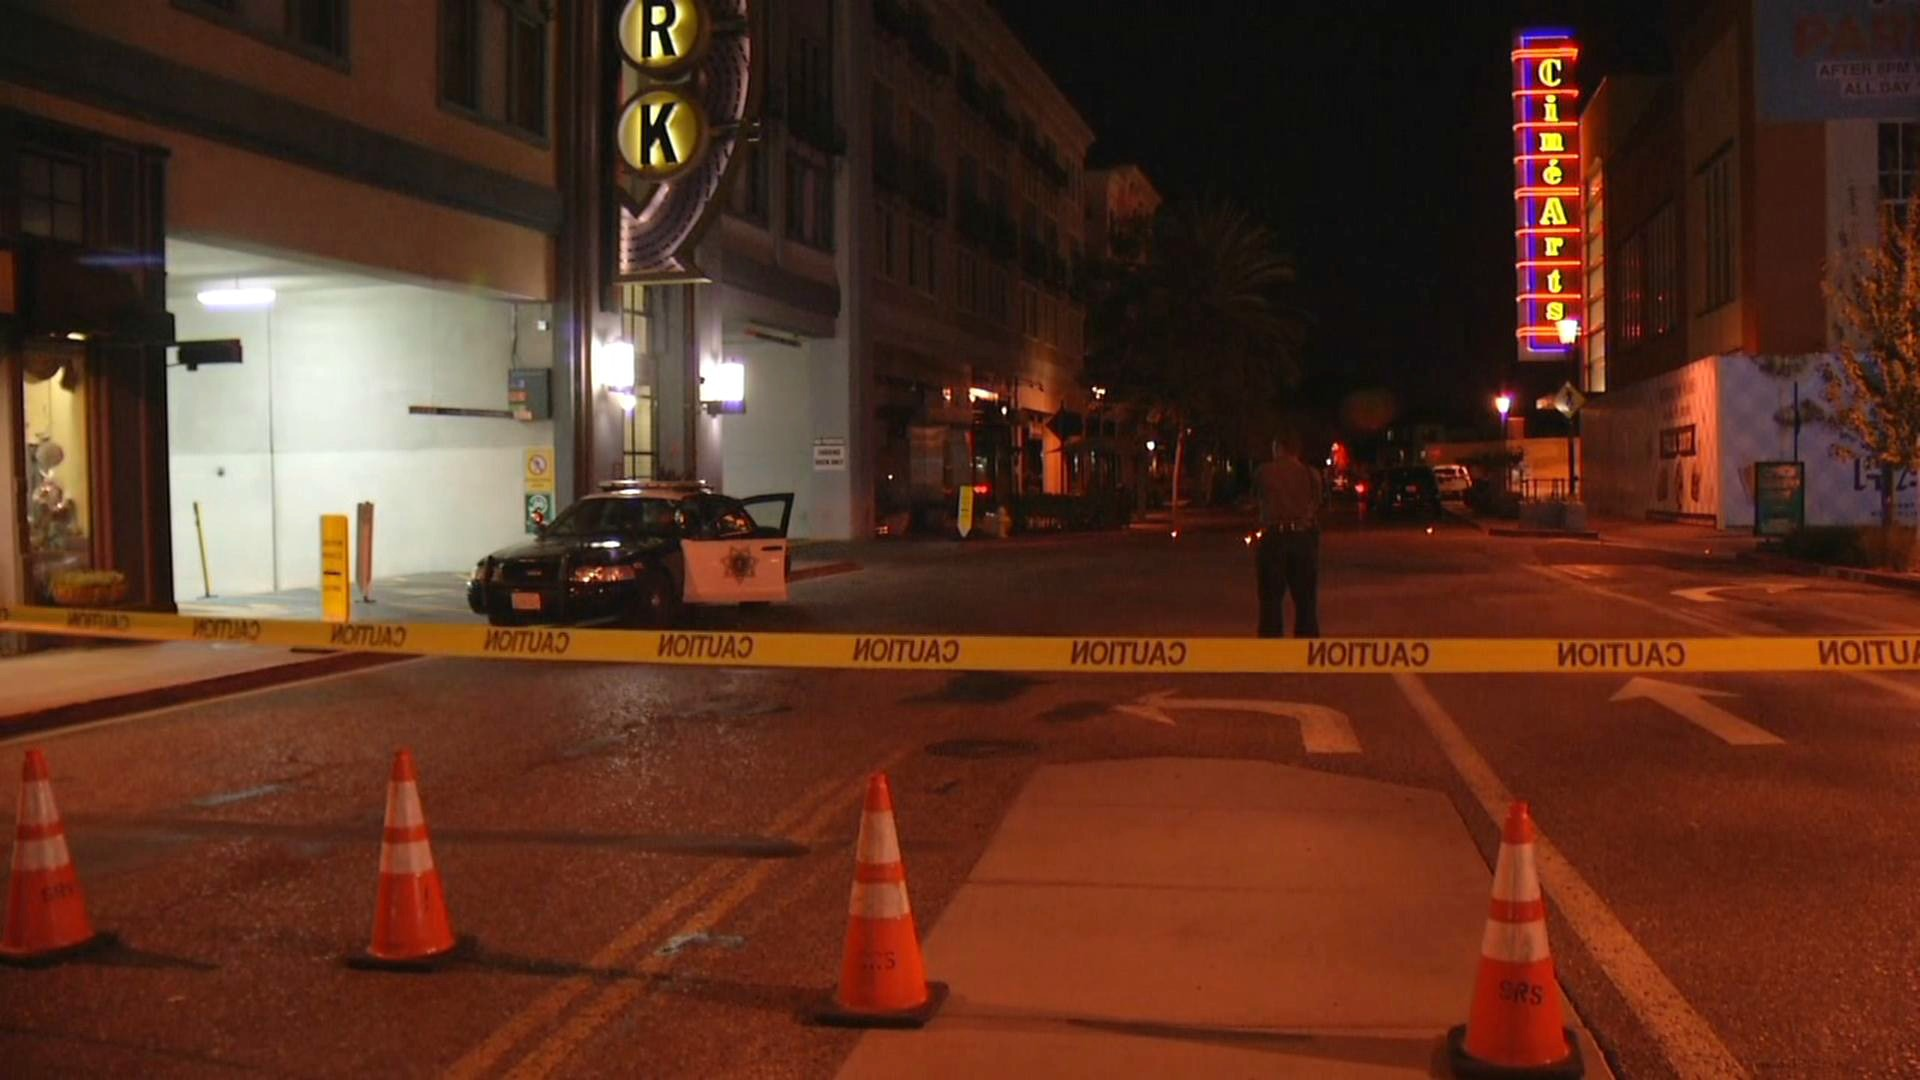 Shots Fired Inside Apartment at Santana Row in San Jose